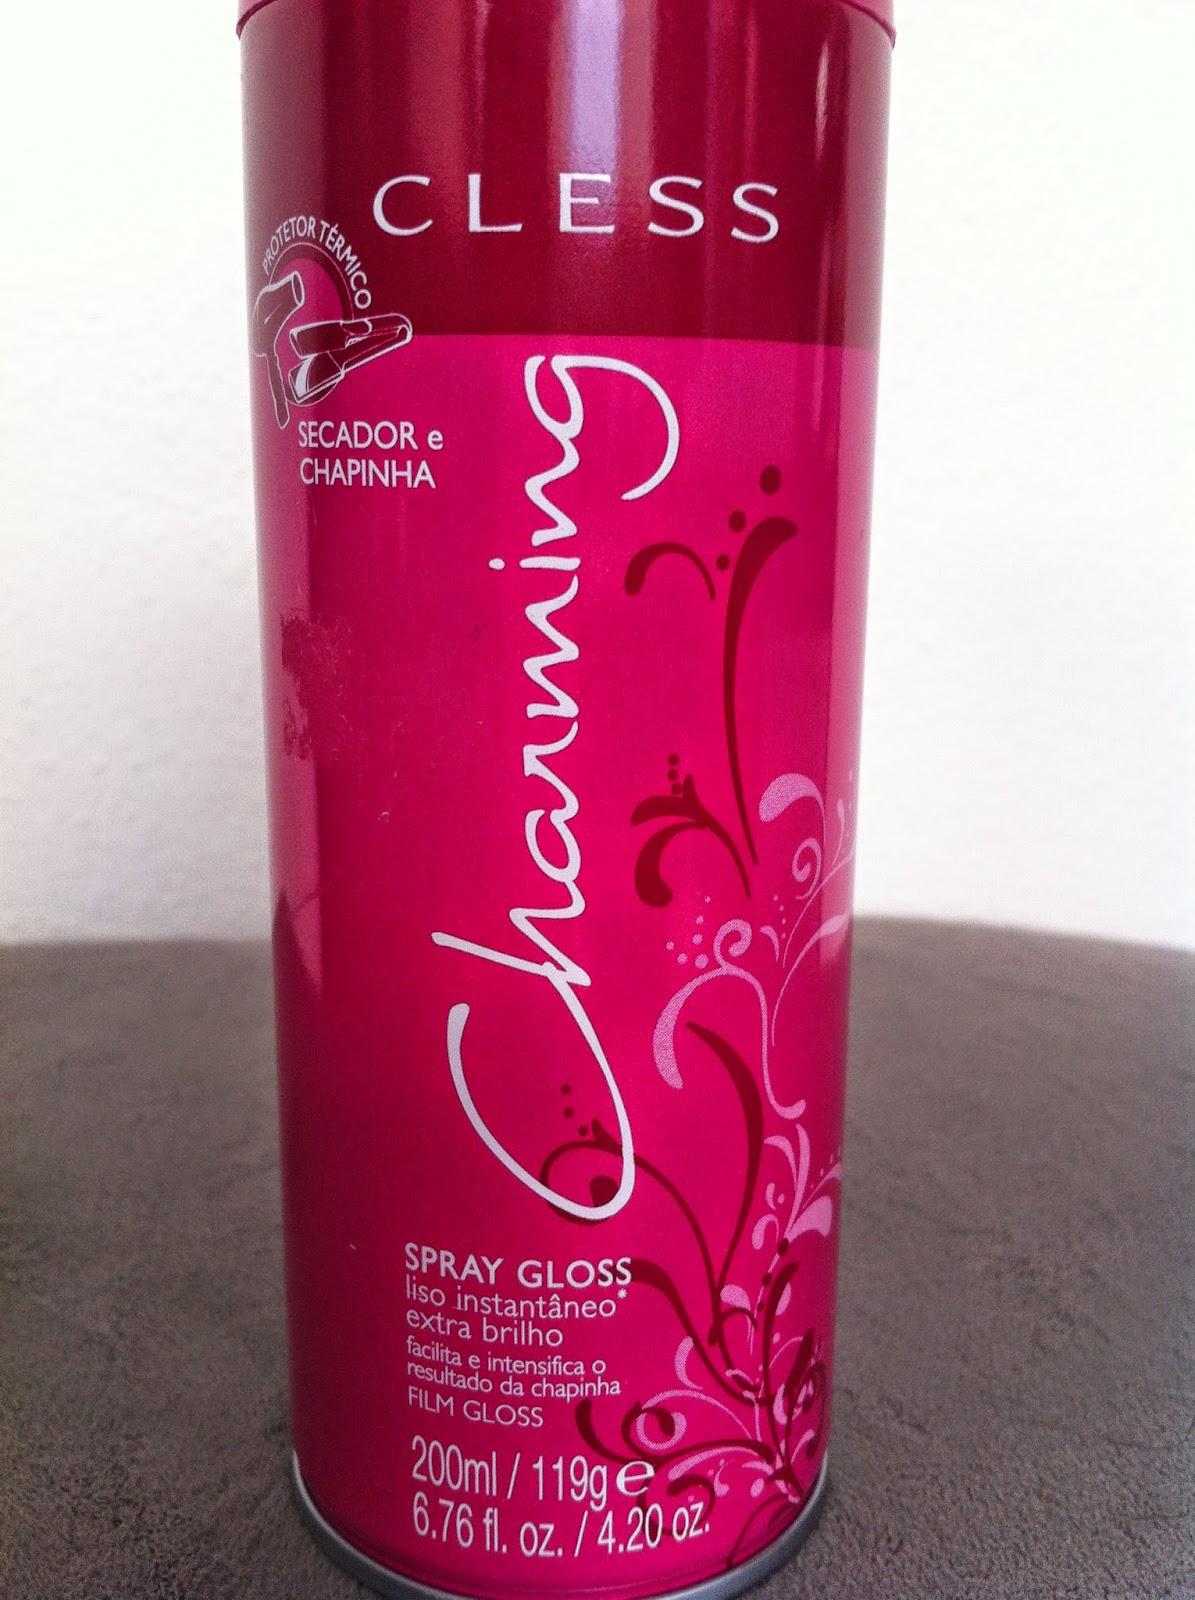 charming, spray, gloss, protetor termico, secador, chapinha, brilho, liso, extra brilho